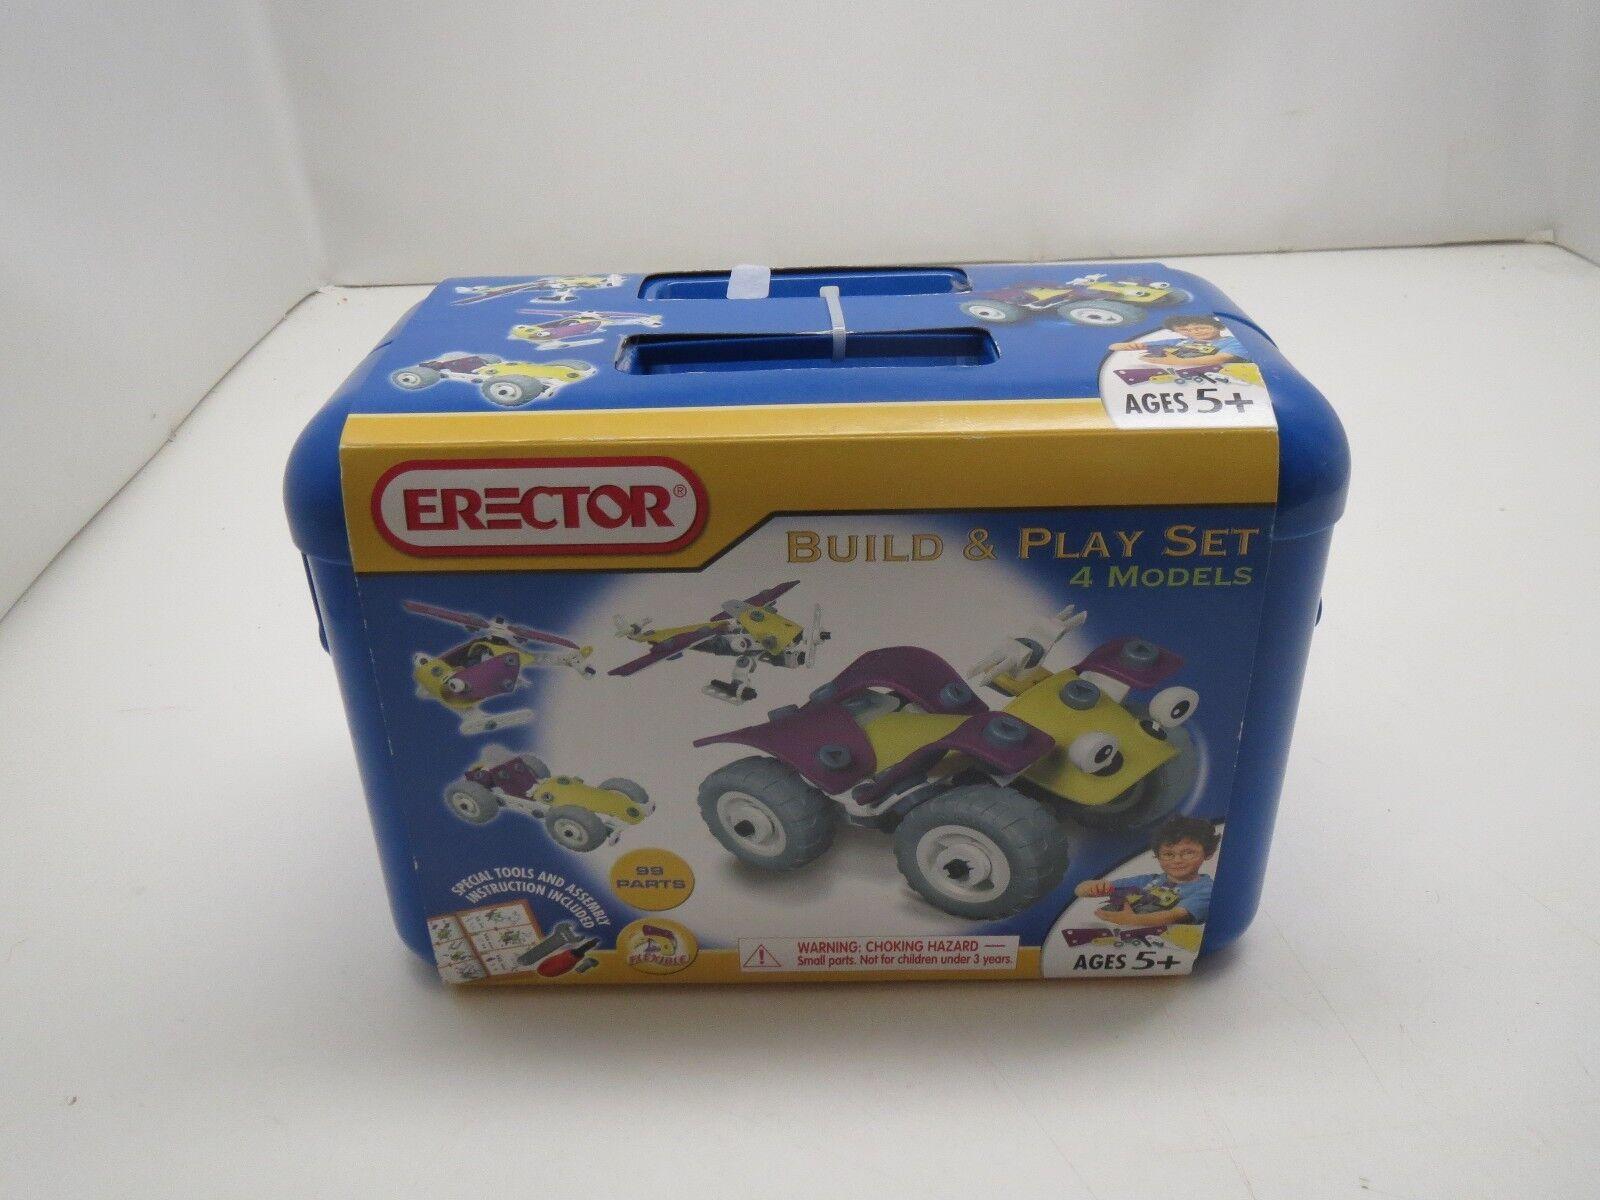 2008 Meccano Maker System 730107e Erector Build And Play Set 4 Models